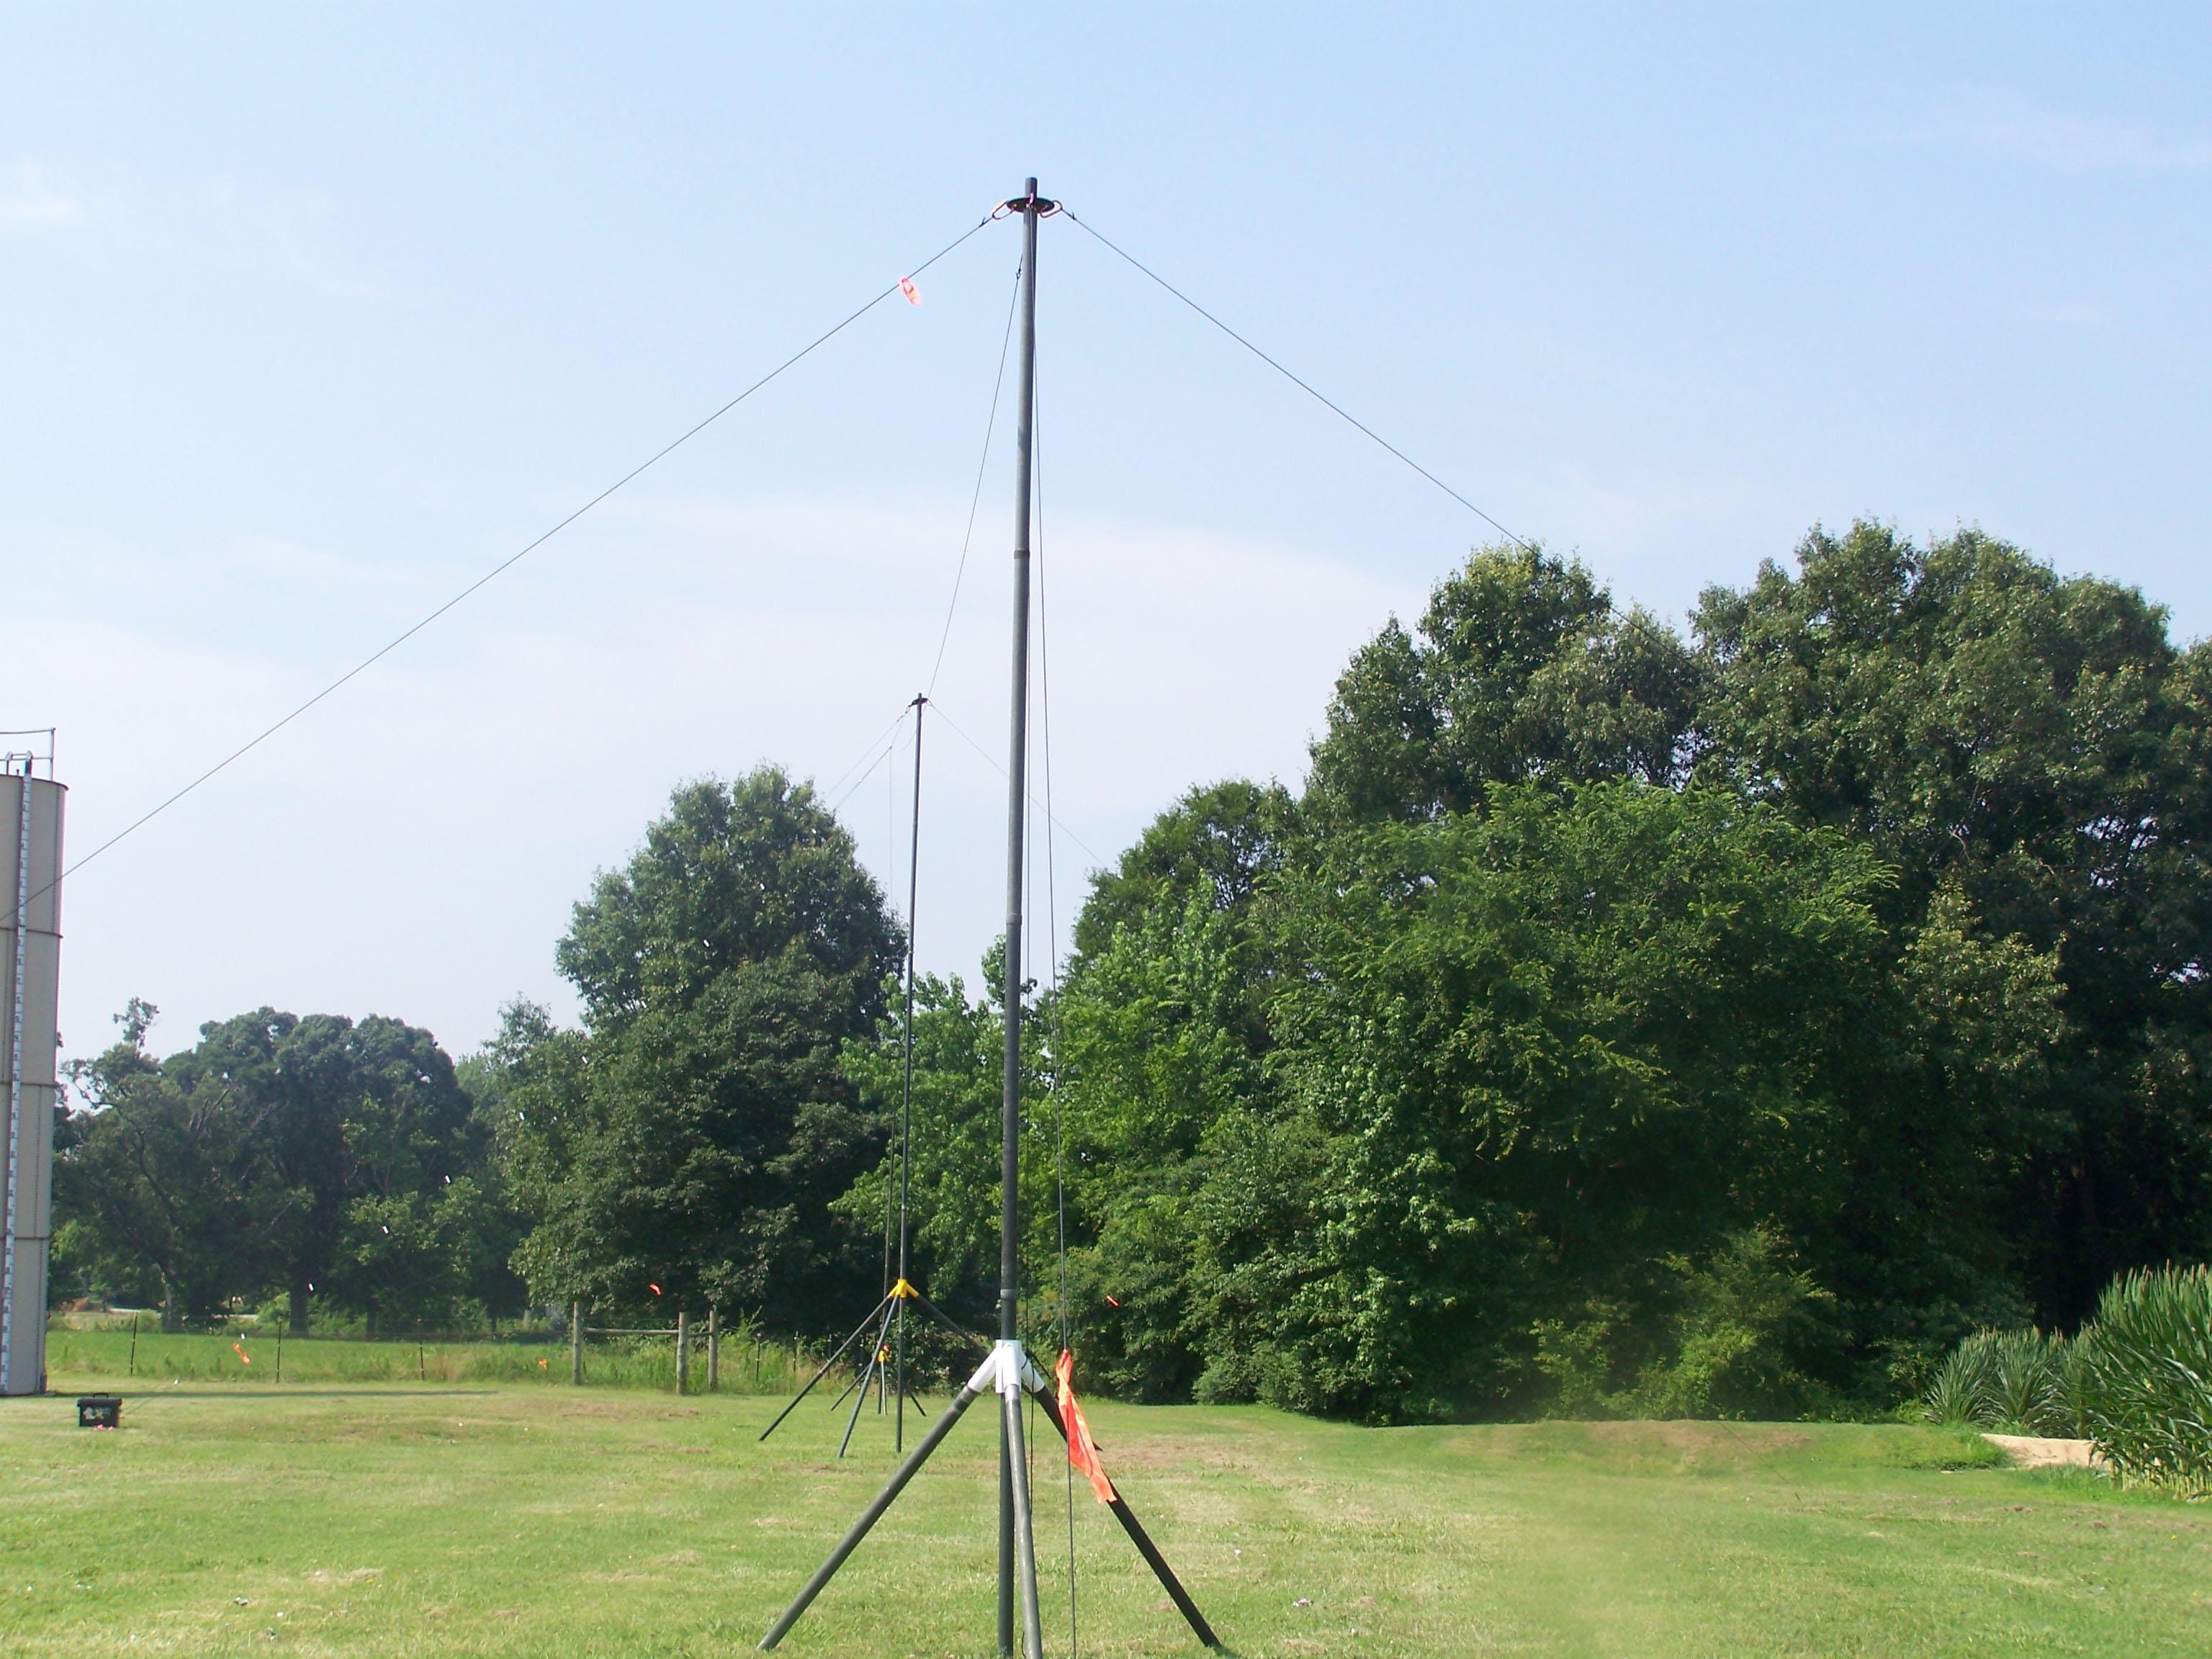 18-inch Penetrators anchoring portable wind antenna